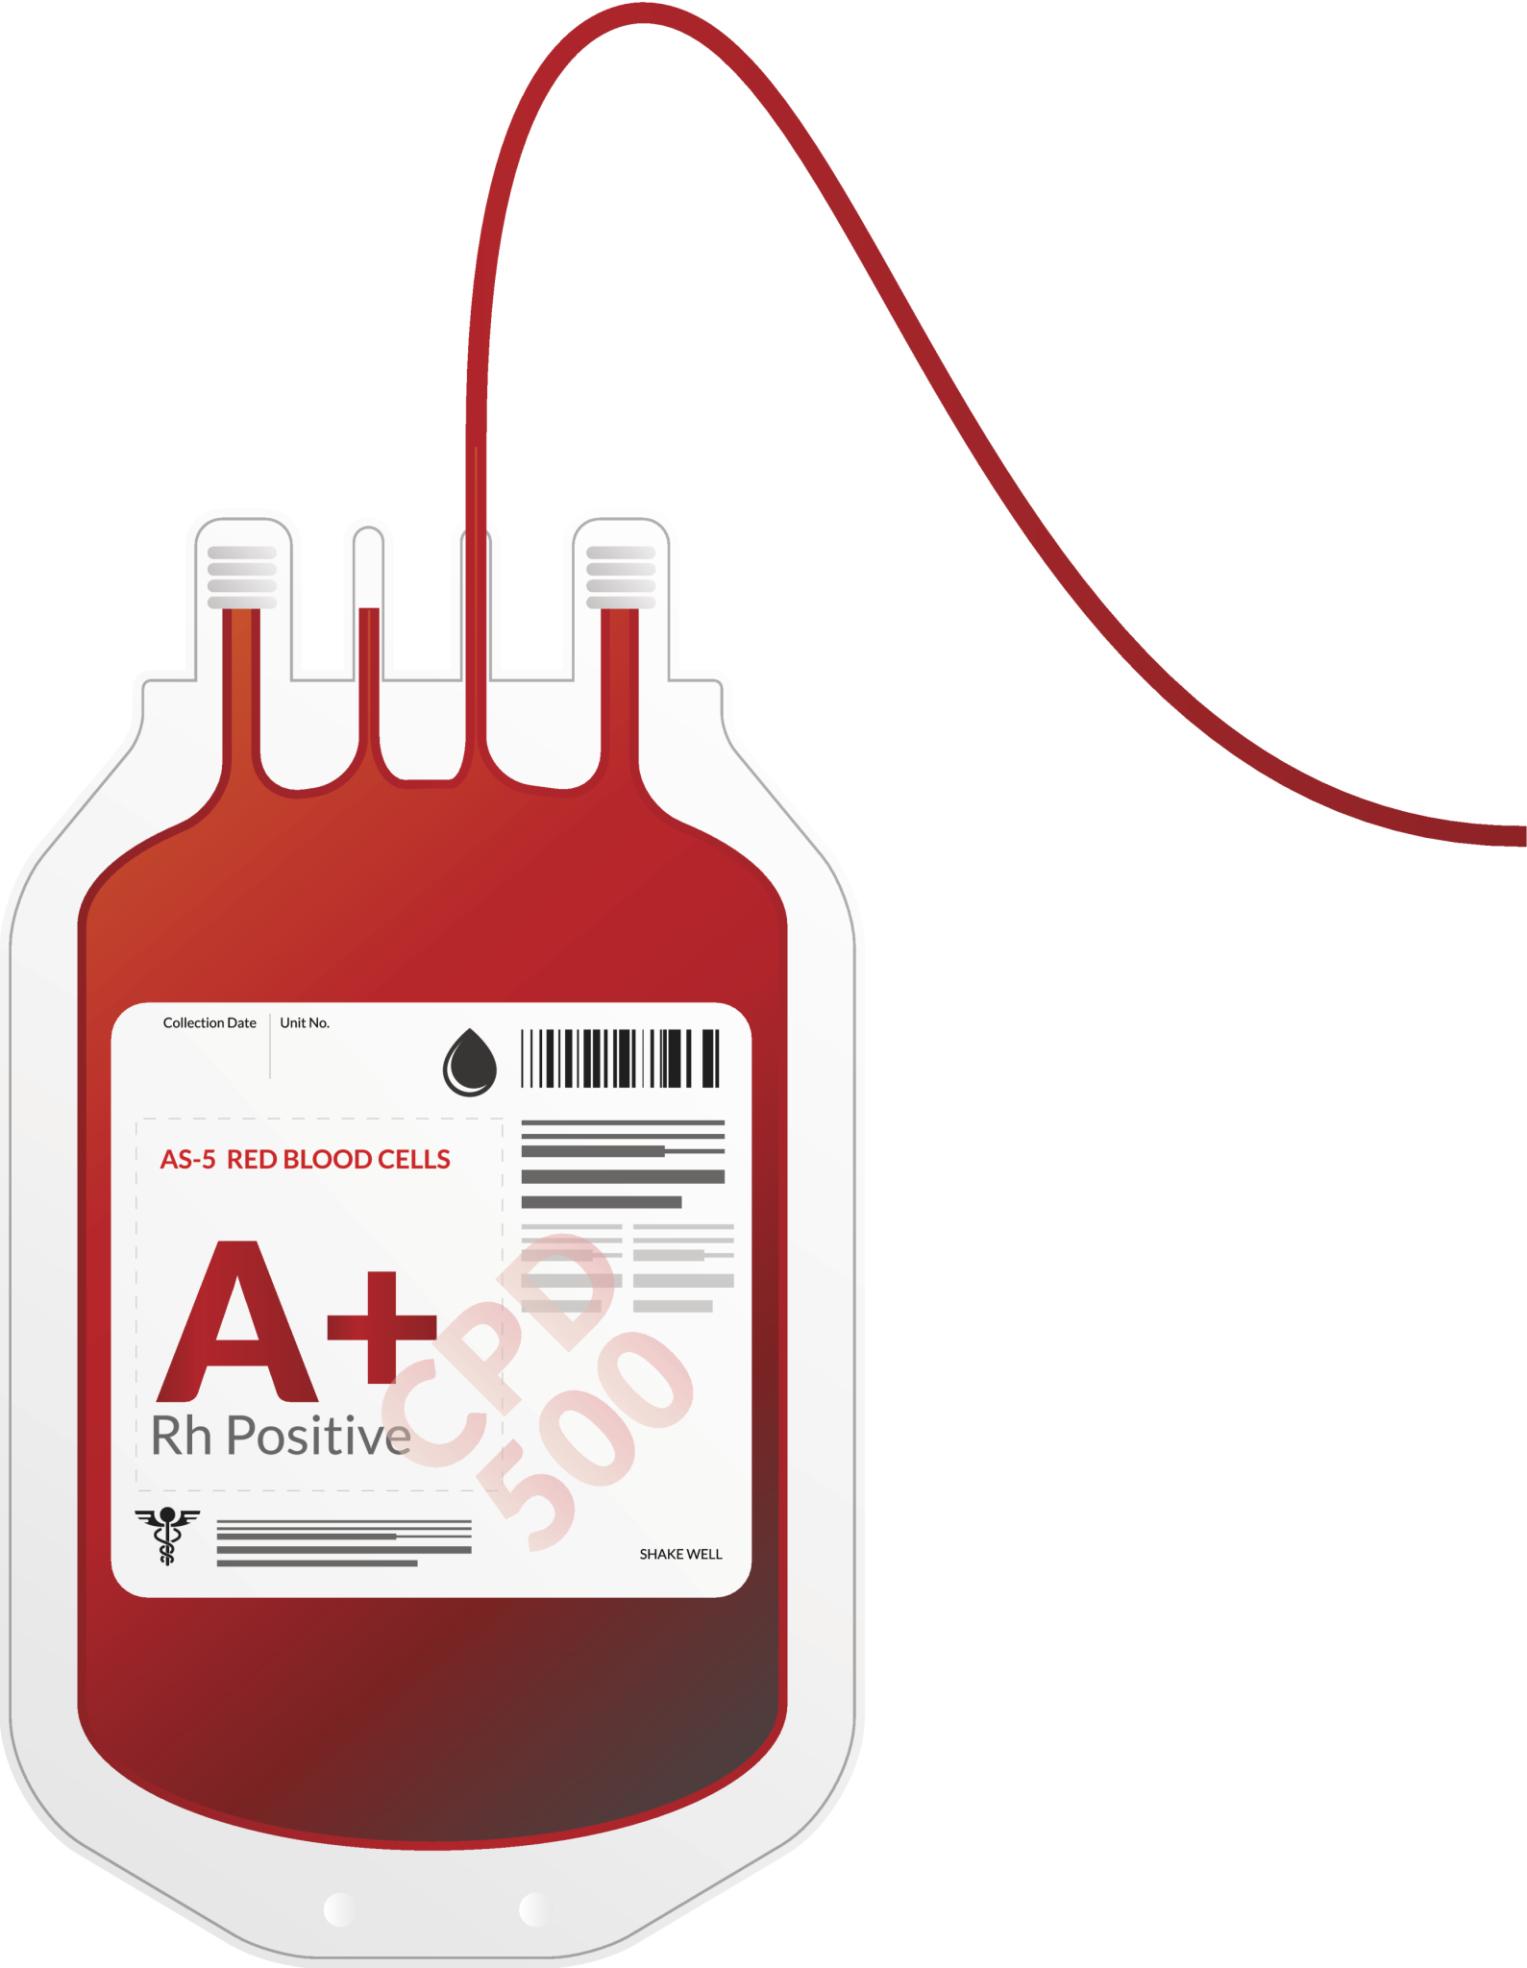 Blood clipart blood bag. Donation png transparent images